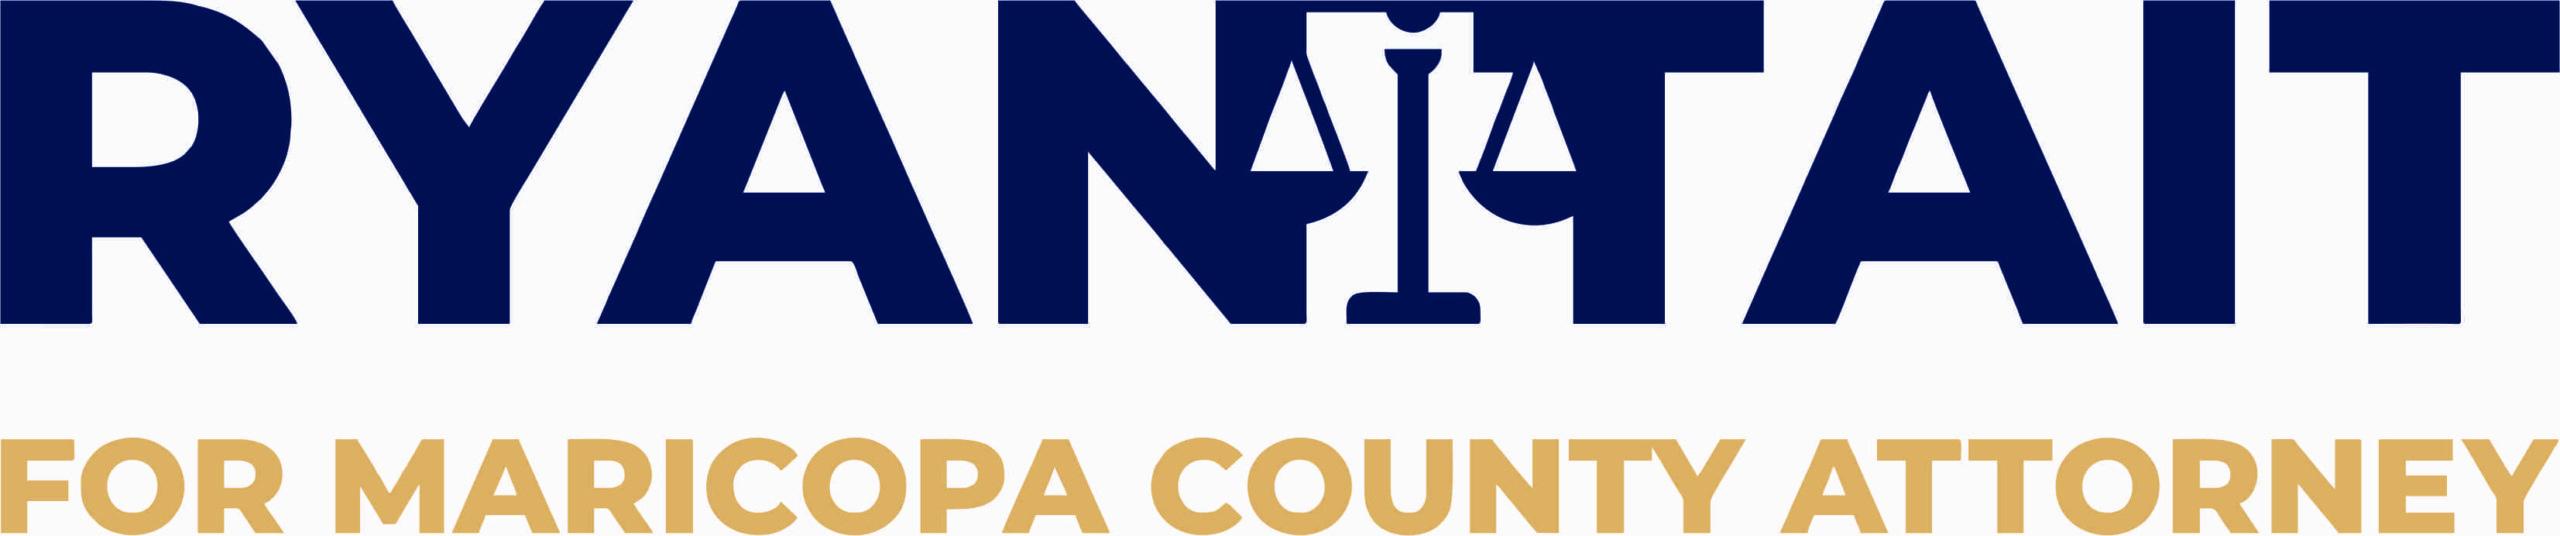 Ryan Tait - Maricopa County Attorney Logo